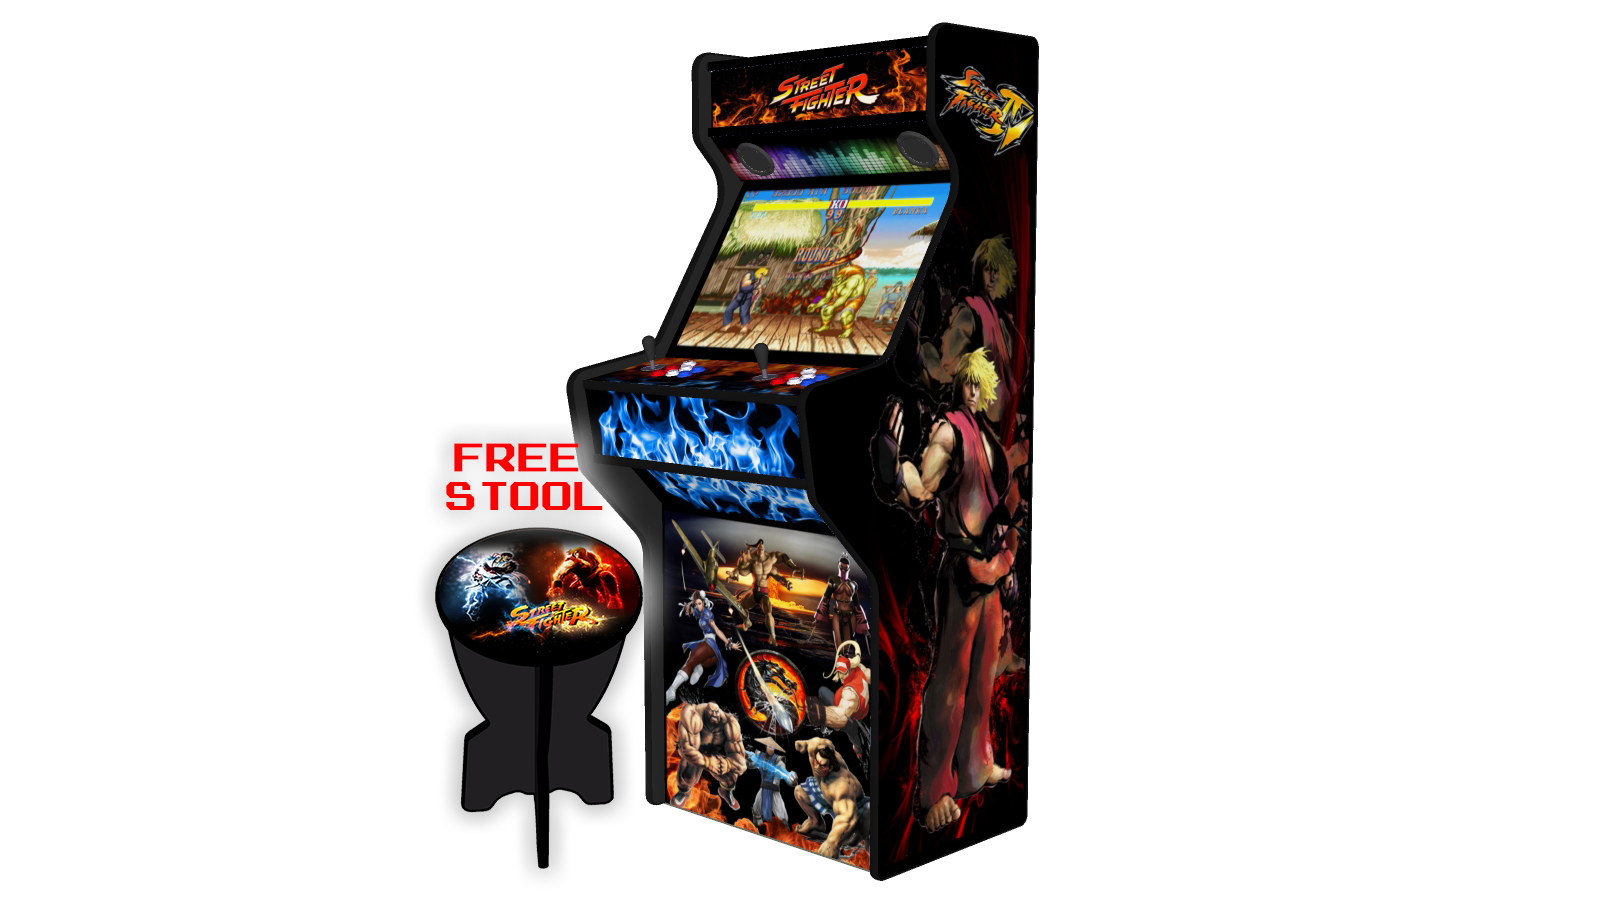 Street Fighter 27 Inch Upright Arcade Machine - American Style Joysticks - Black Tmold - Right